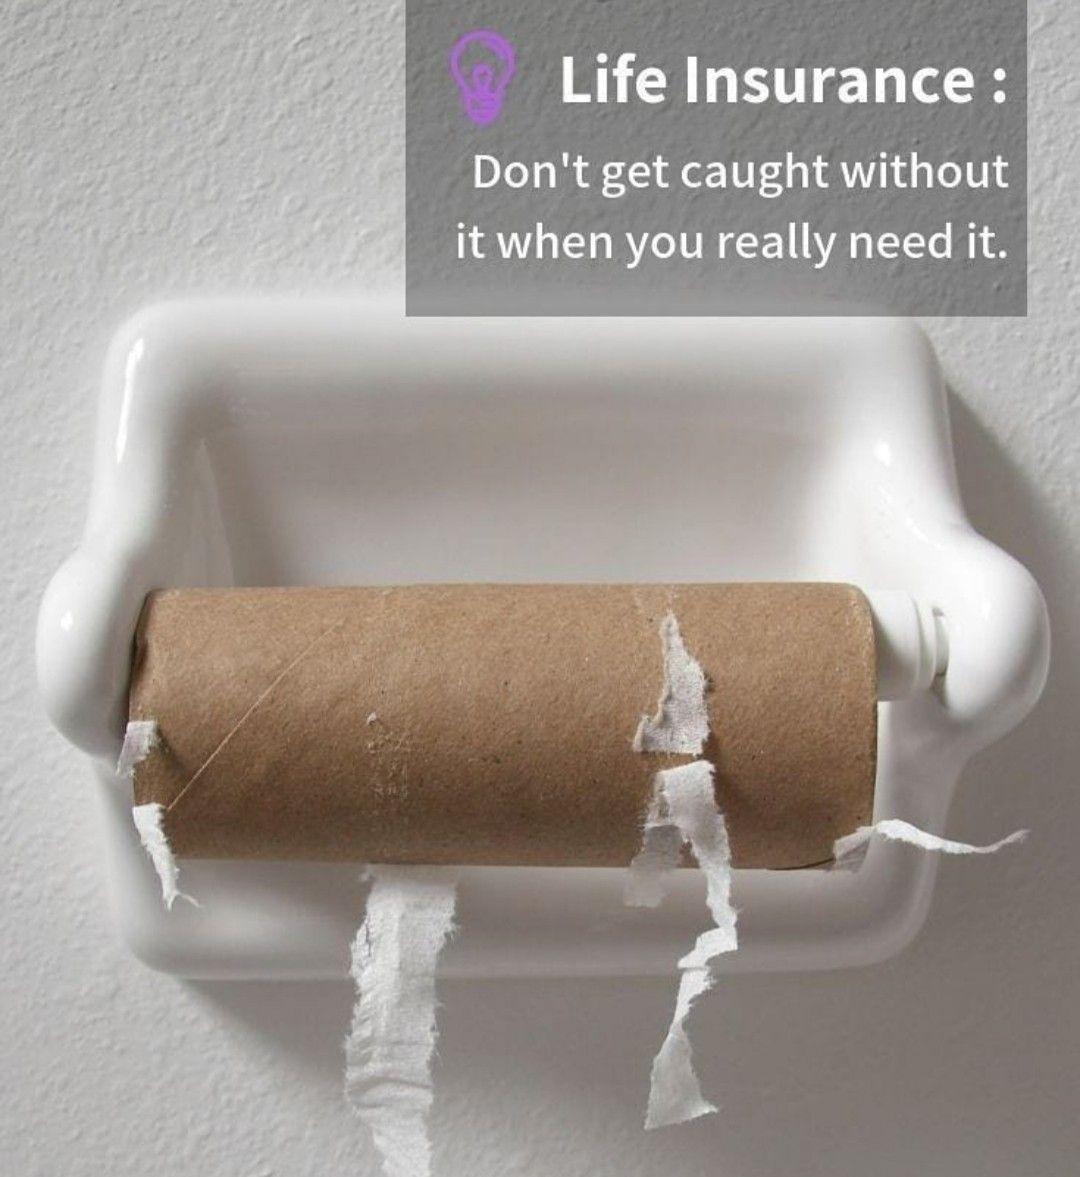 insurance_realtalk Life insurance broker, Insurance